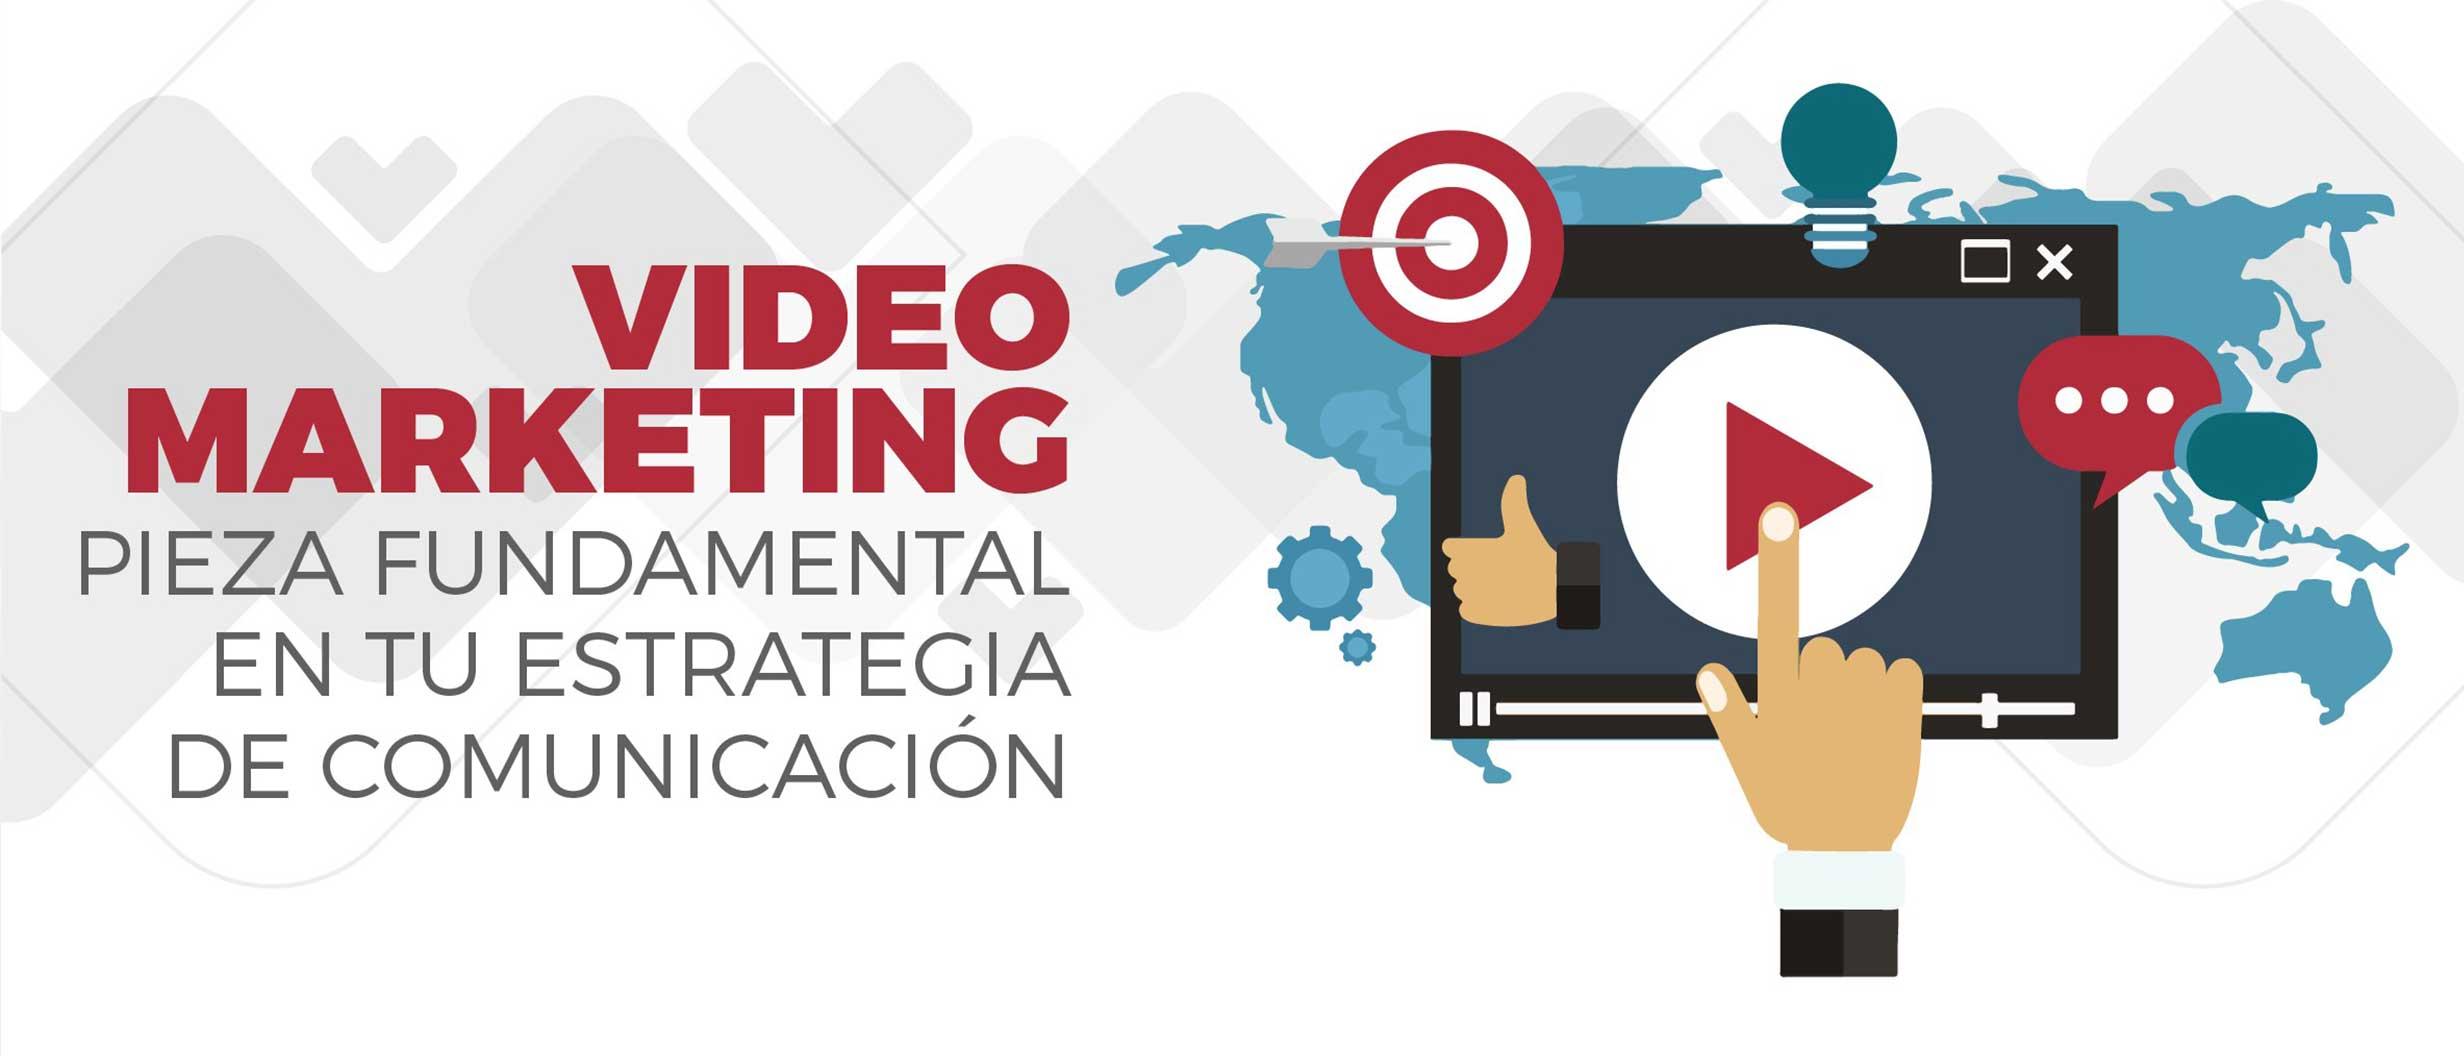 Video-Marketing-ok